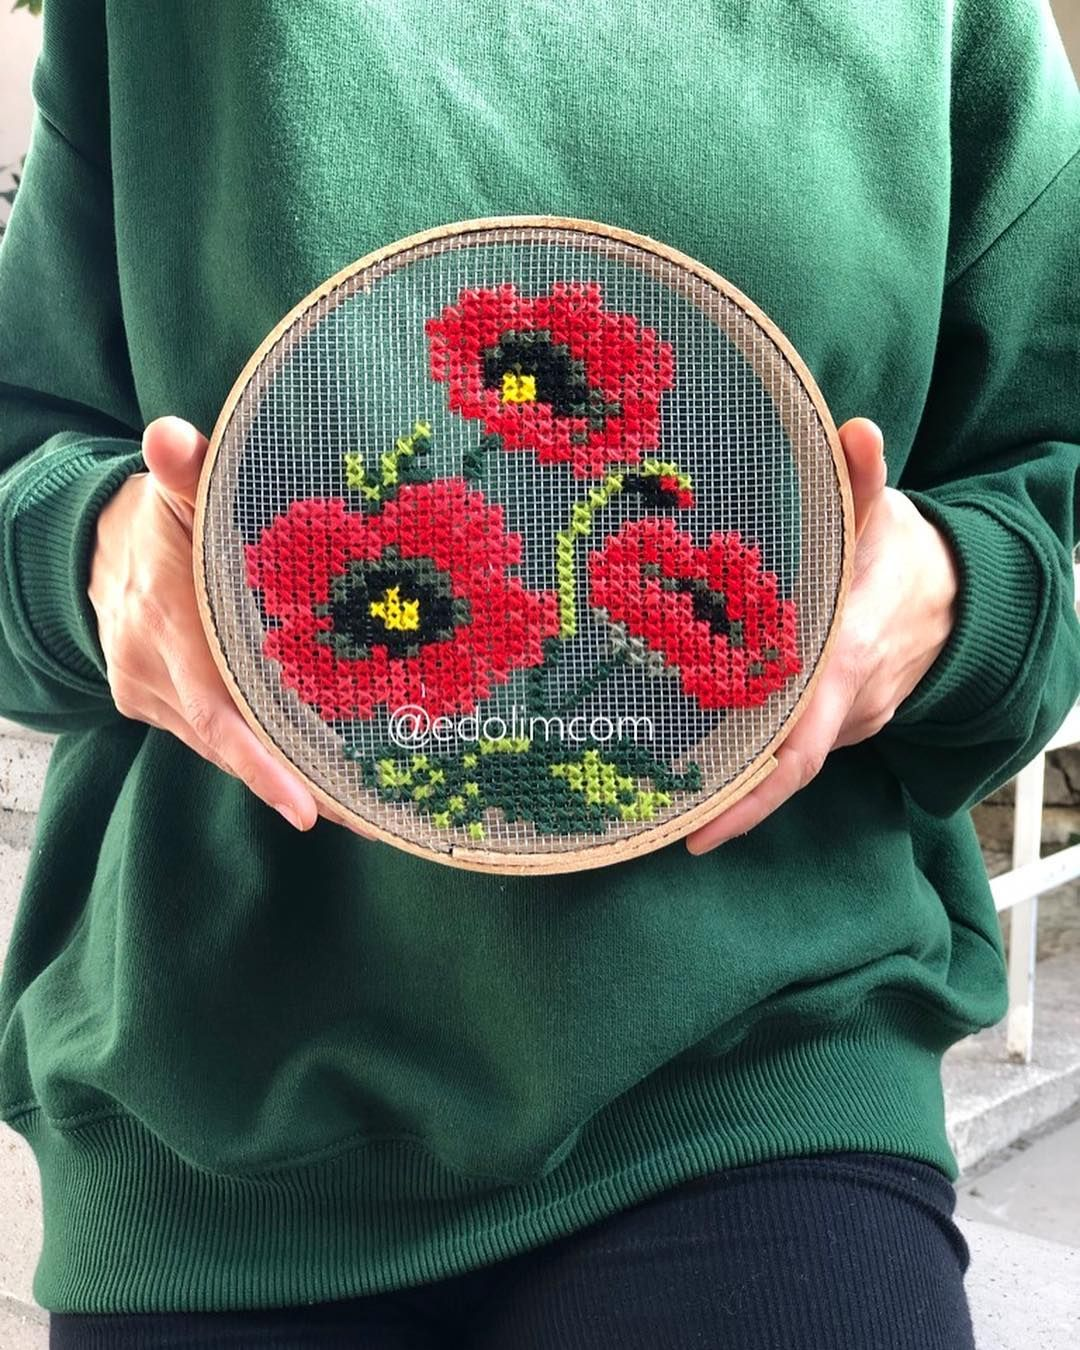 "edolim sur Instagram: ""bons marchés 🌺🍀 disponibles auprès de DM happ # happsunday #poppy #crossstitch #flowers #embroidery #embroideryart #embroider # embroiderydesign…""   – Kanaviçe"